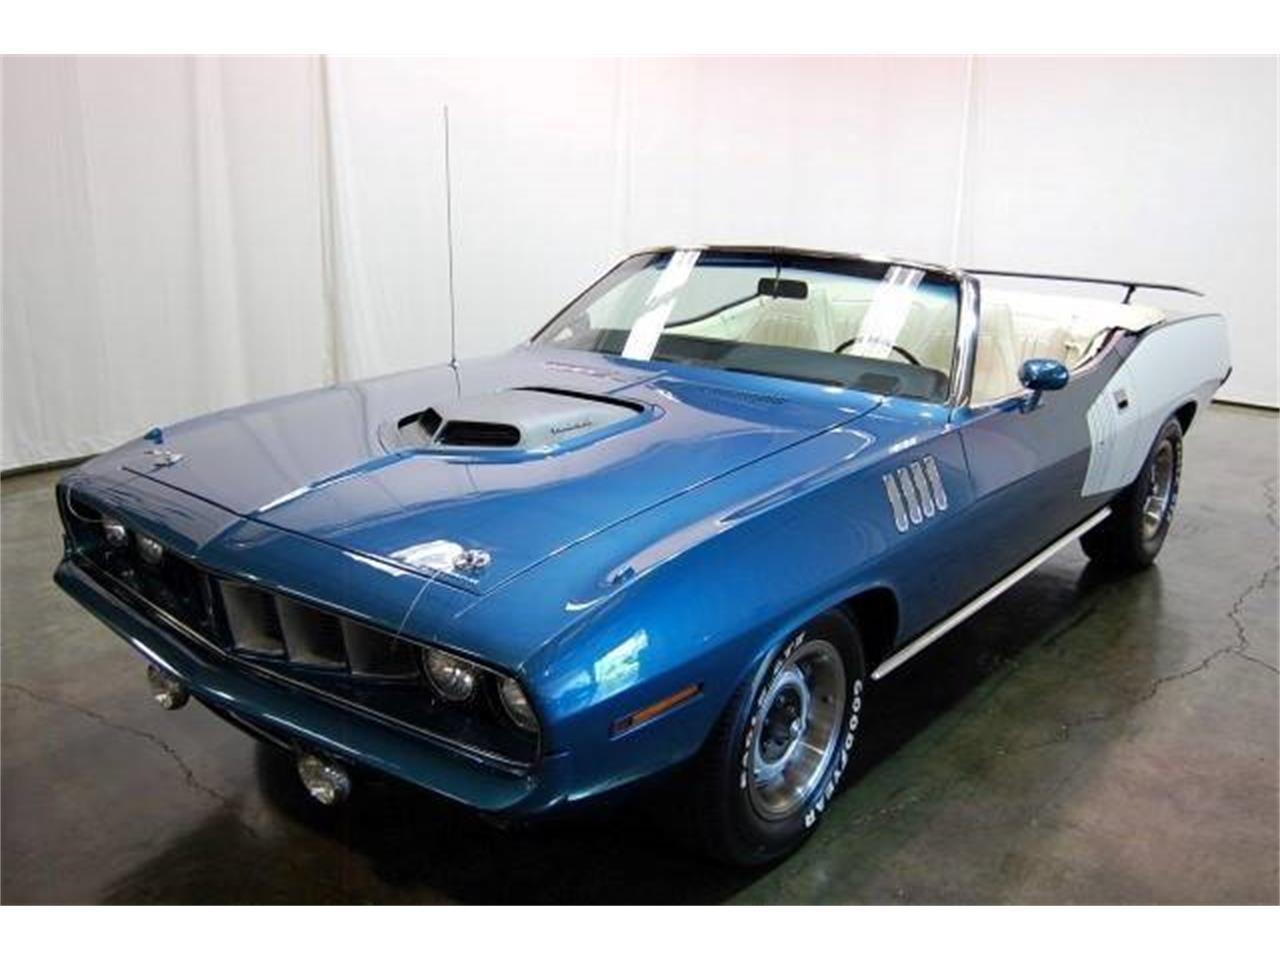 For Sale: 1971 Plymouth Cuda in Marietta, Georgia